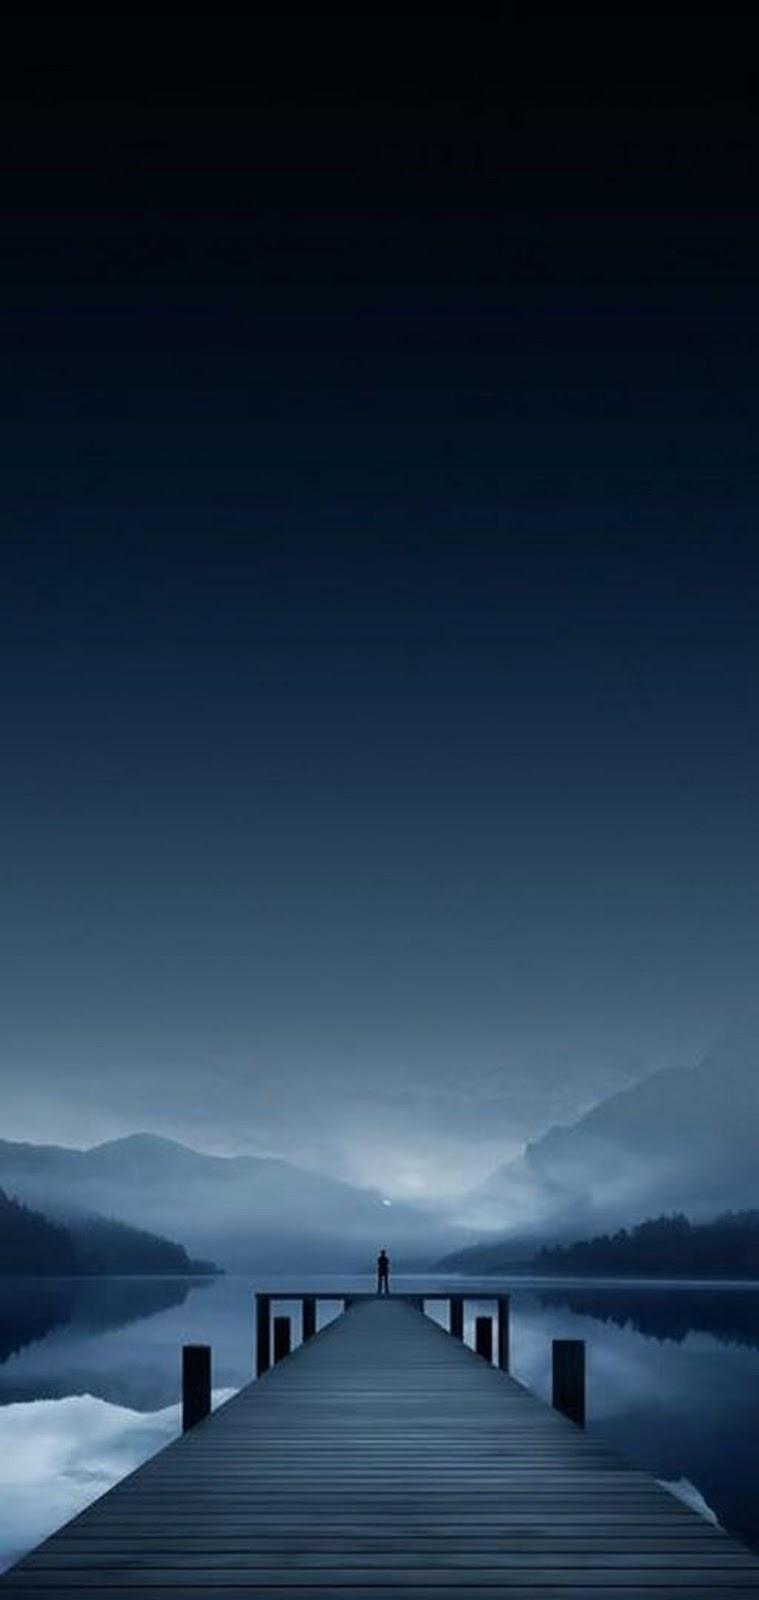 Iphone 11 Background Screen Wallpaper 2020 Top4um